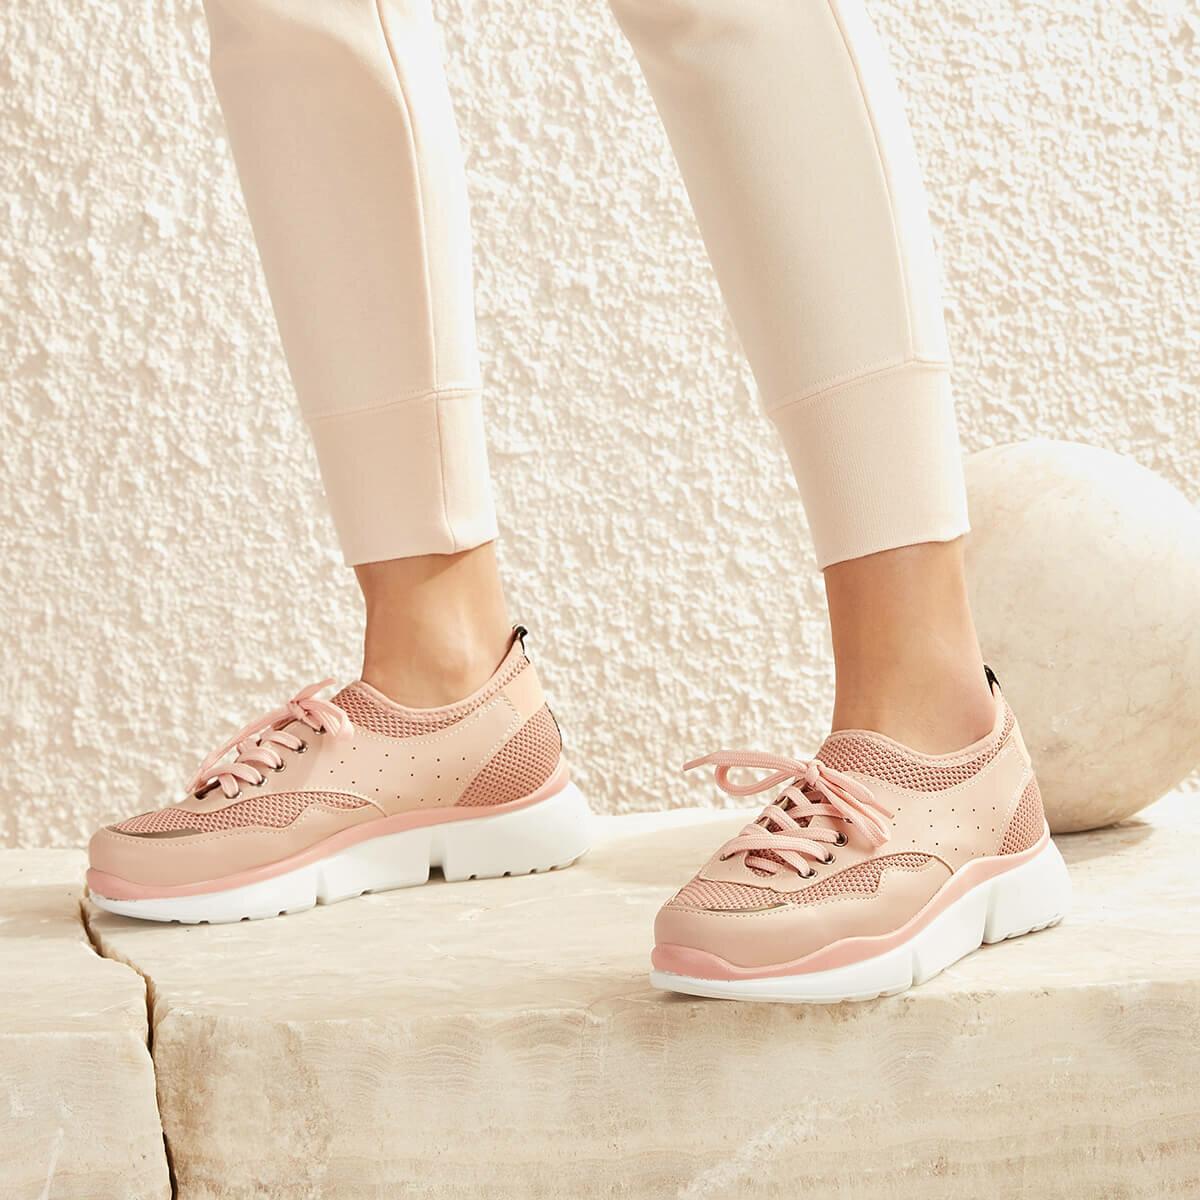 FLO MELTEM04Z SKIN Powder Women 'S Sneaker Shoes BUTIGO